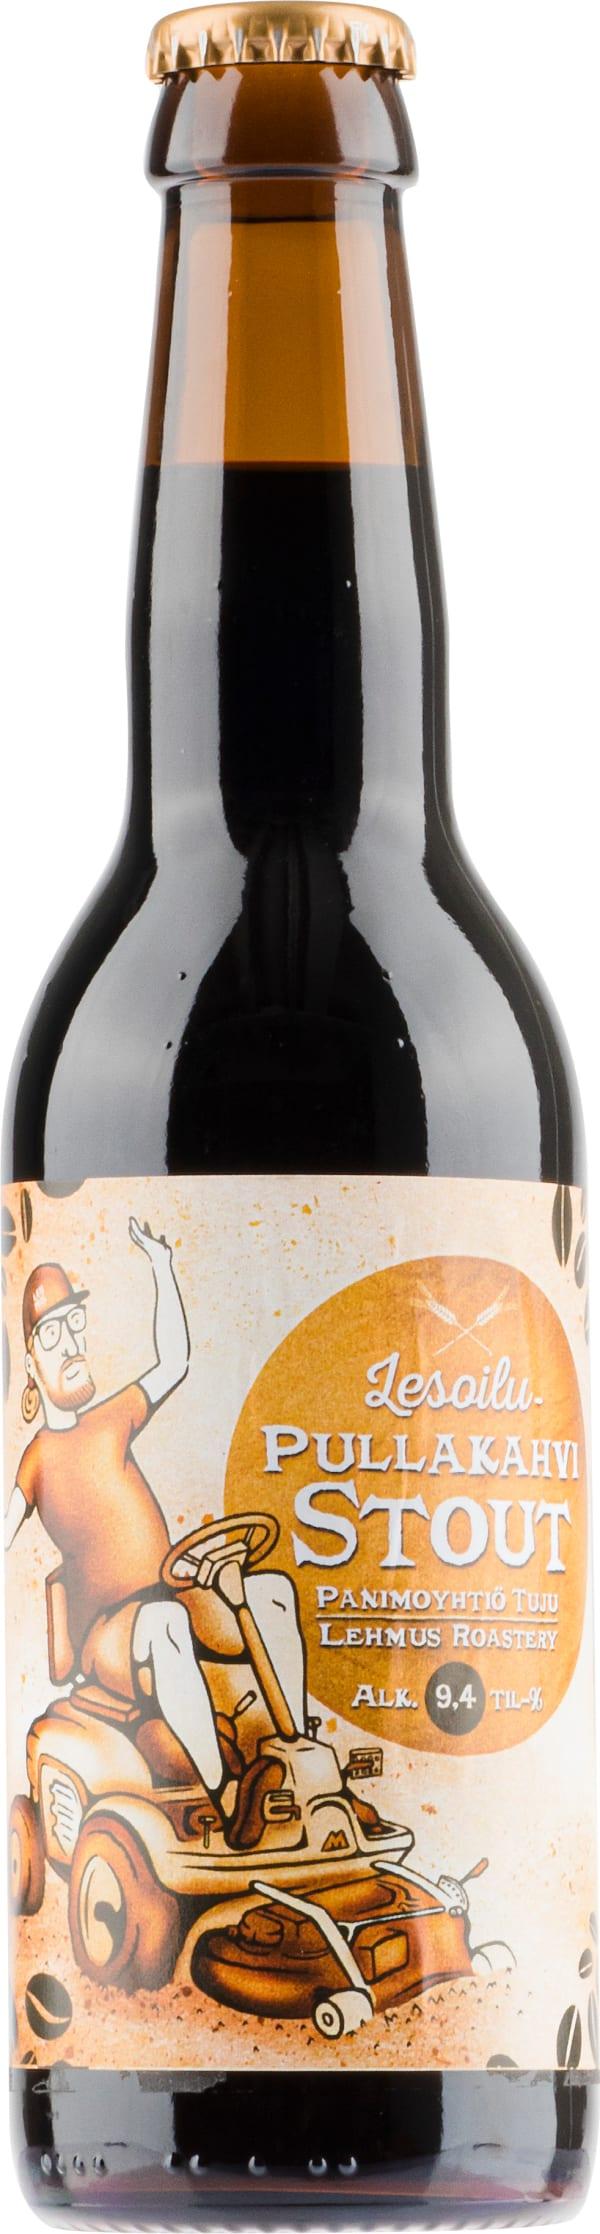 Tuju Lesoilu Pullakahvi Stout